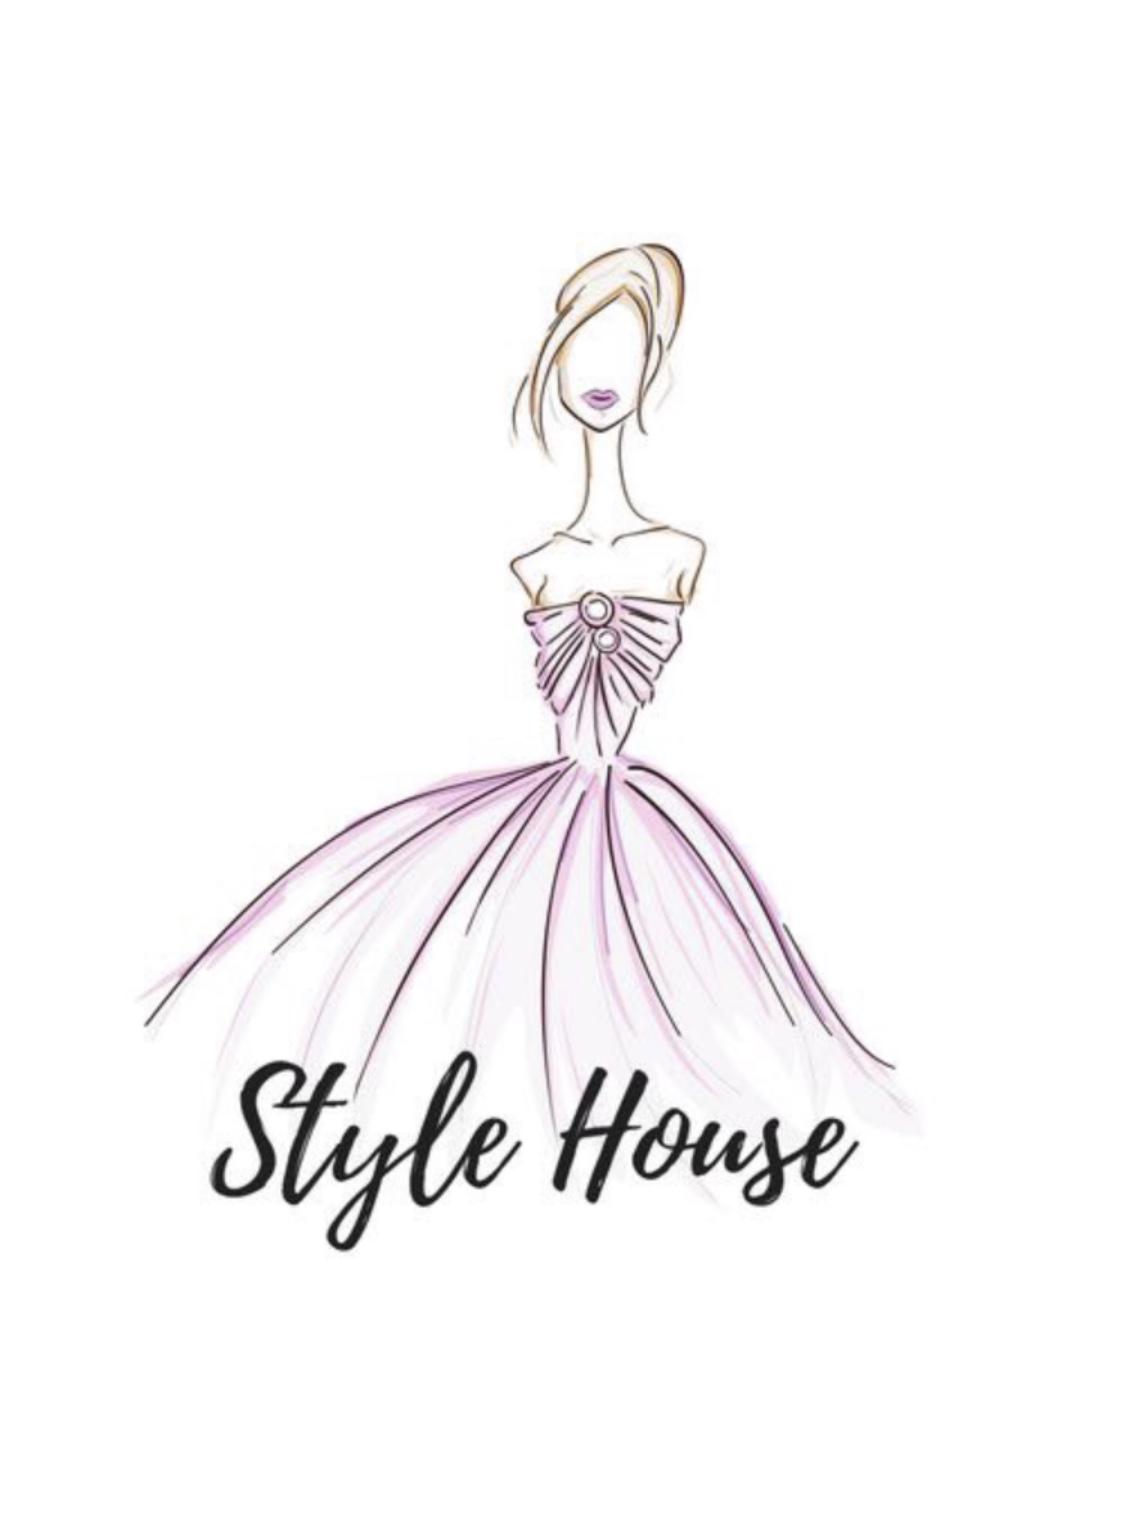 Stylehouse